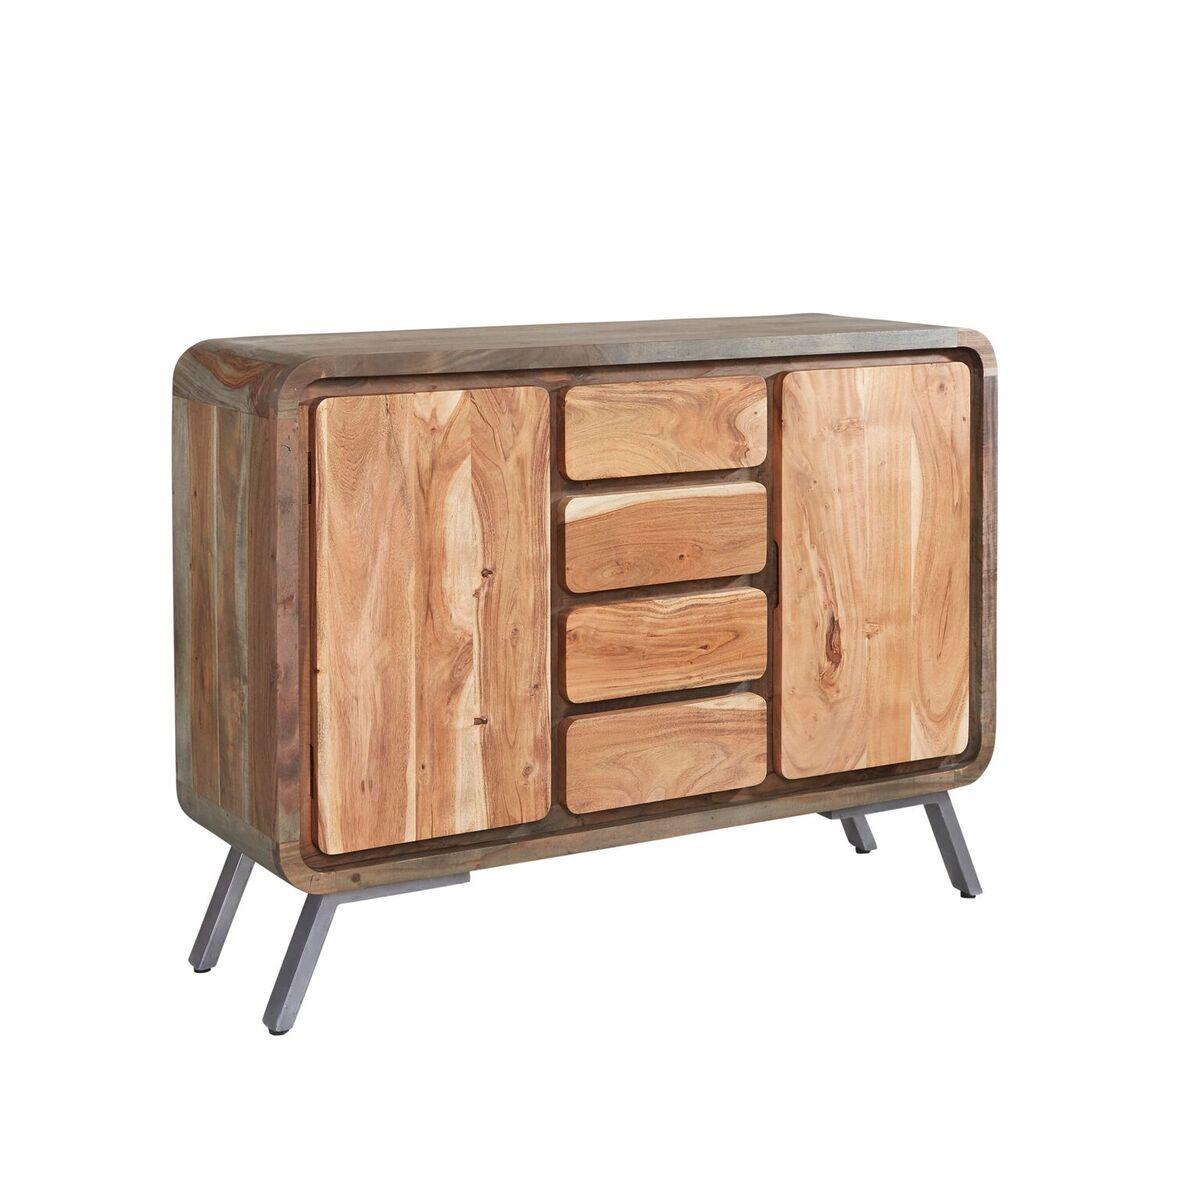 Aspen Iron/Wooden - Large Sideboard